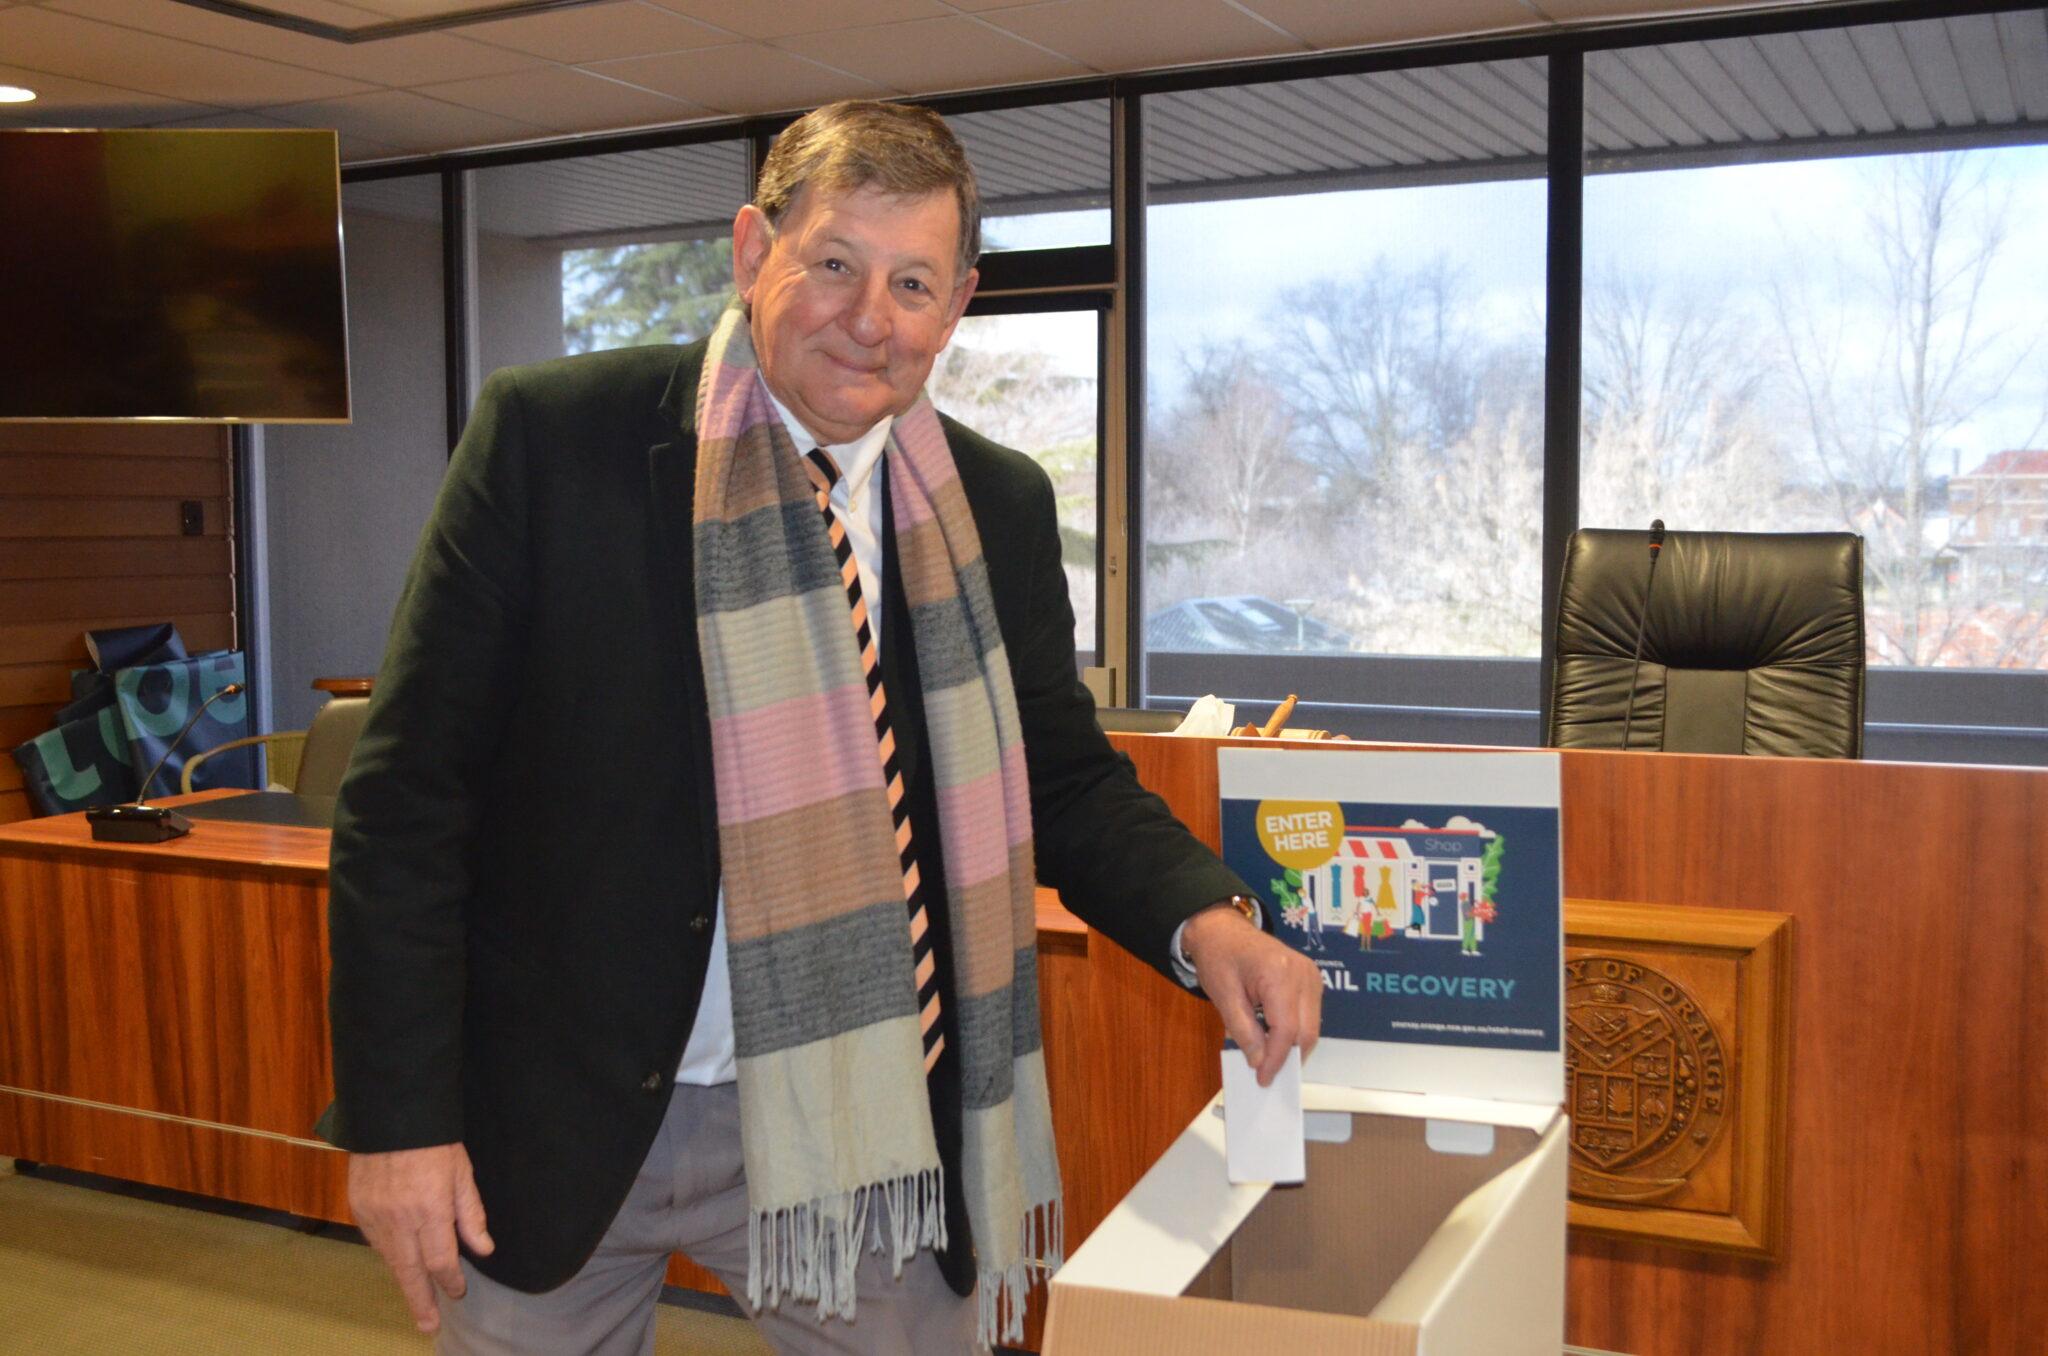 Mayor and ballot box